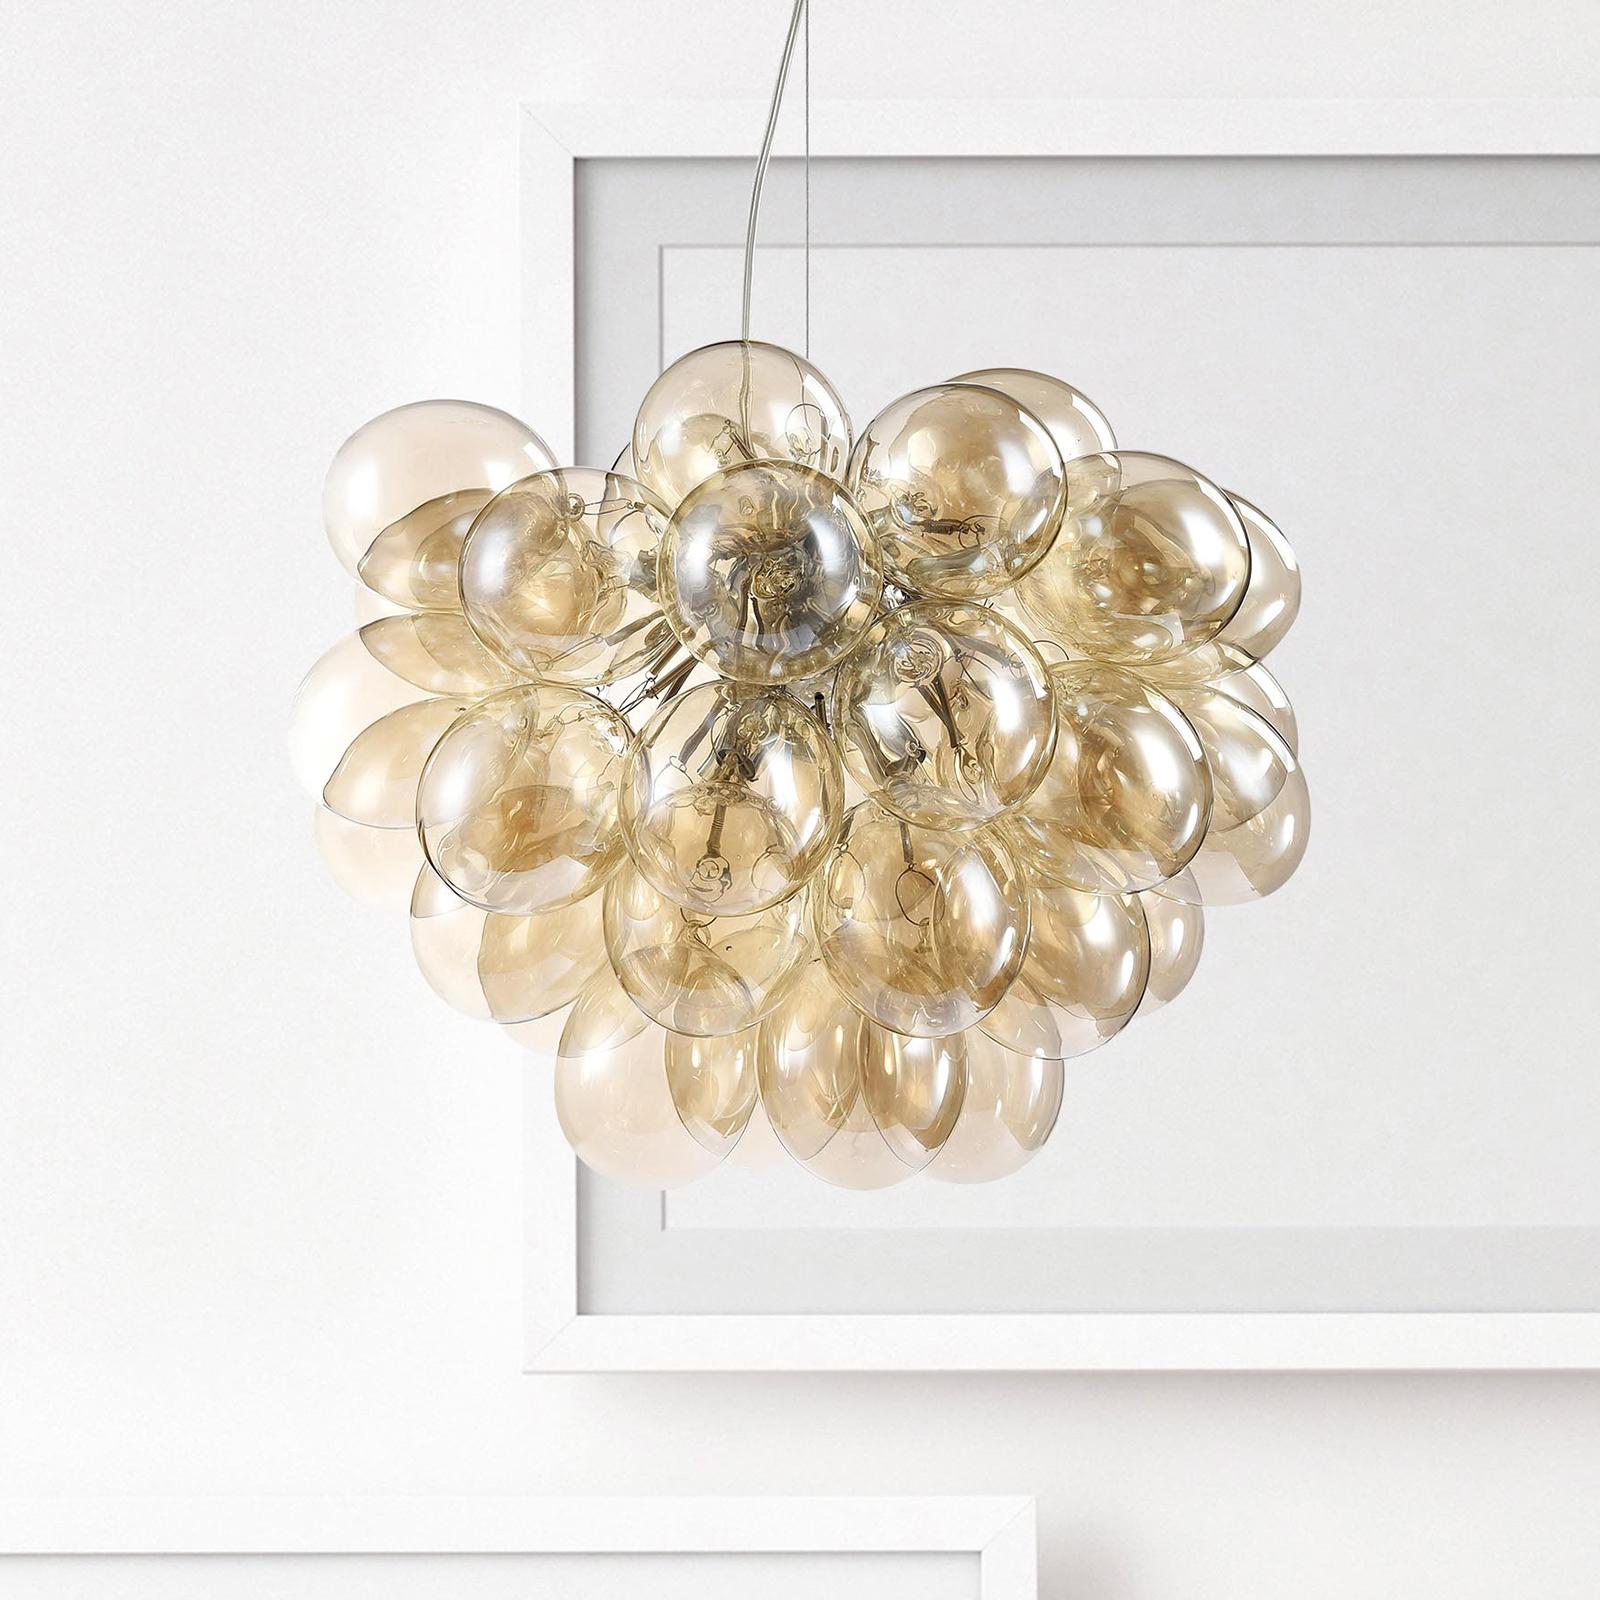 Hanglamp Balbo in origineel druiven design